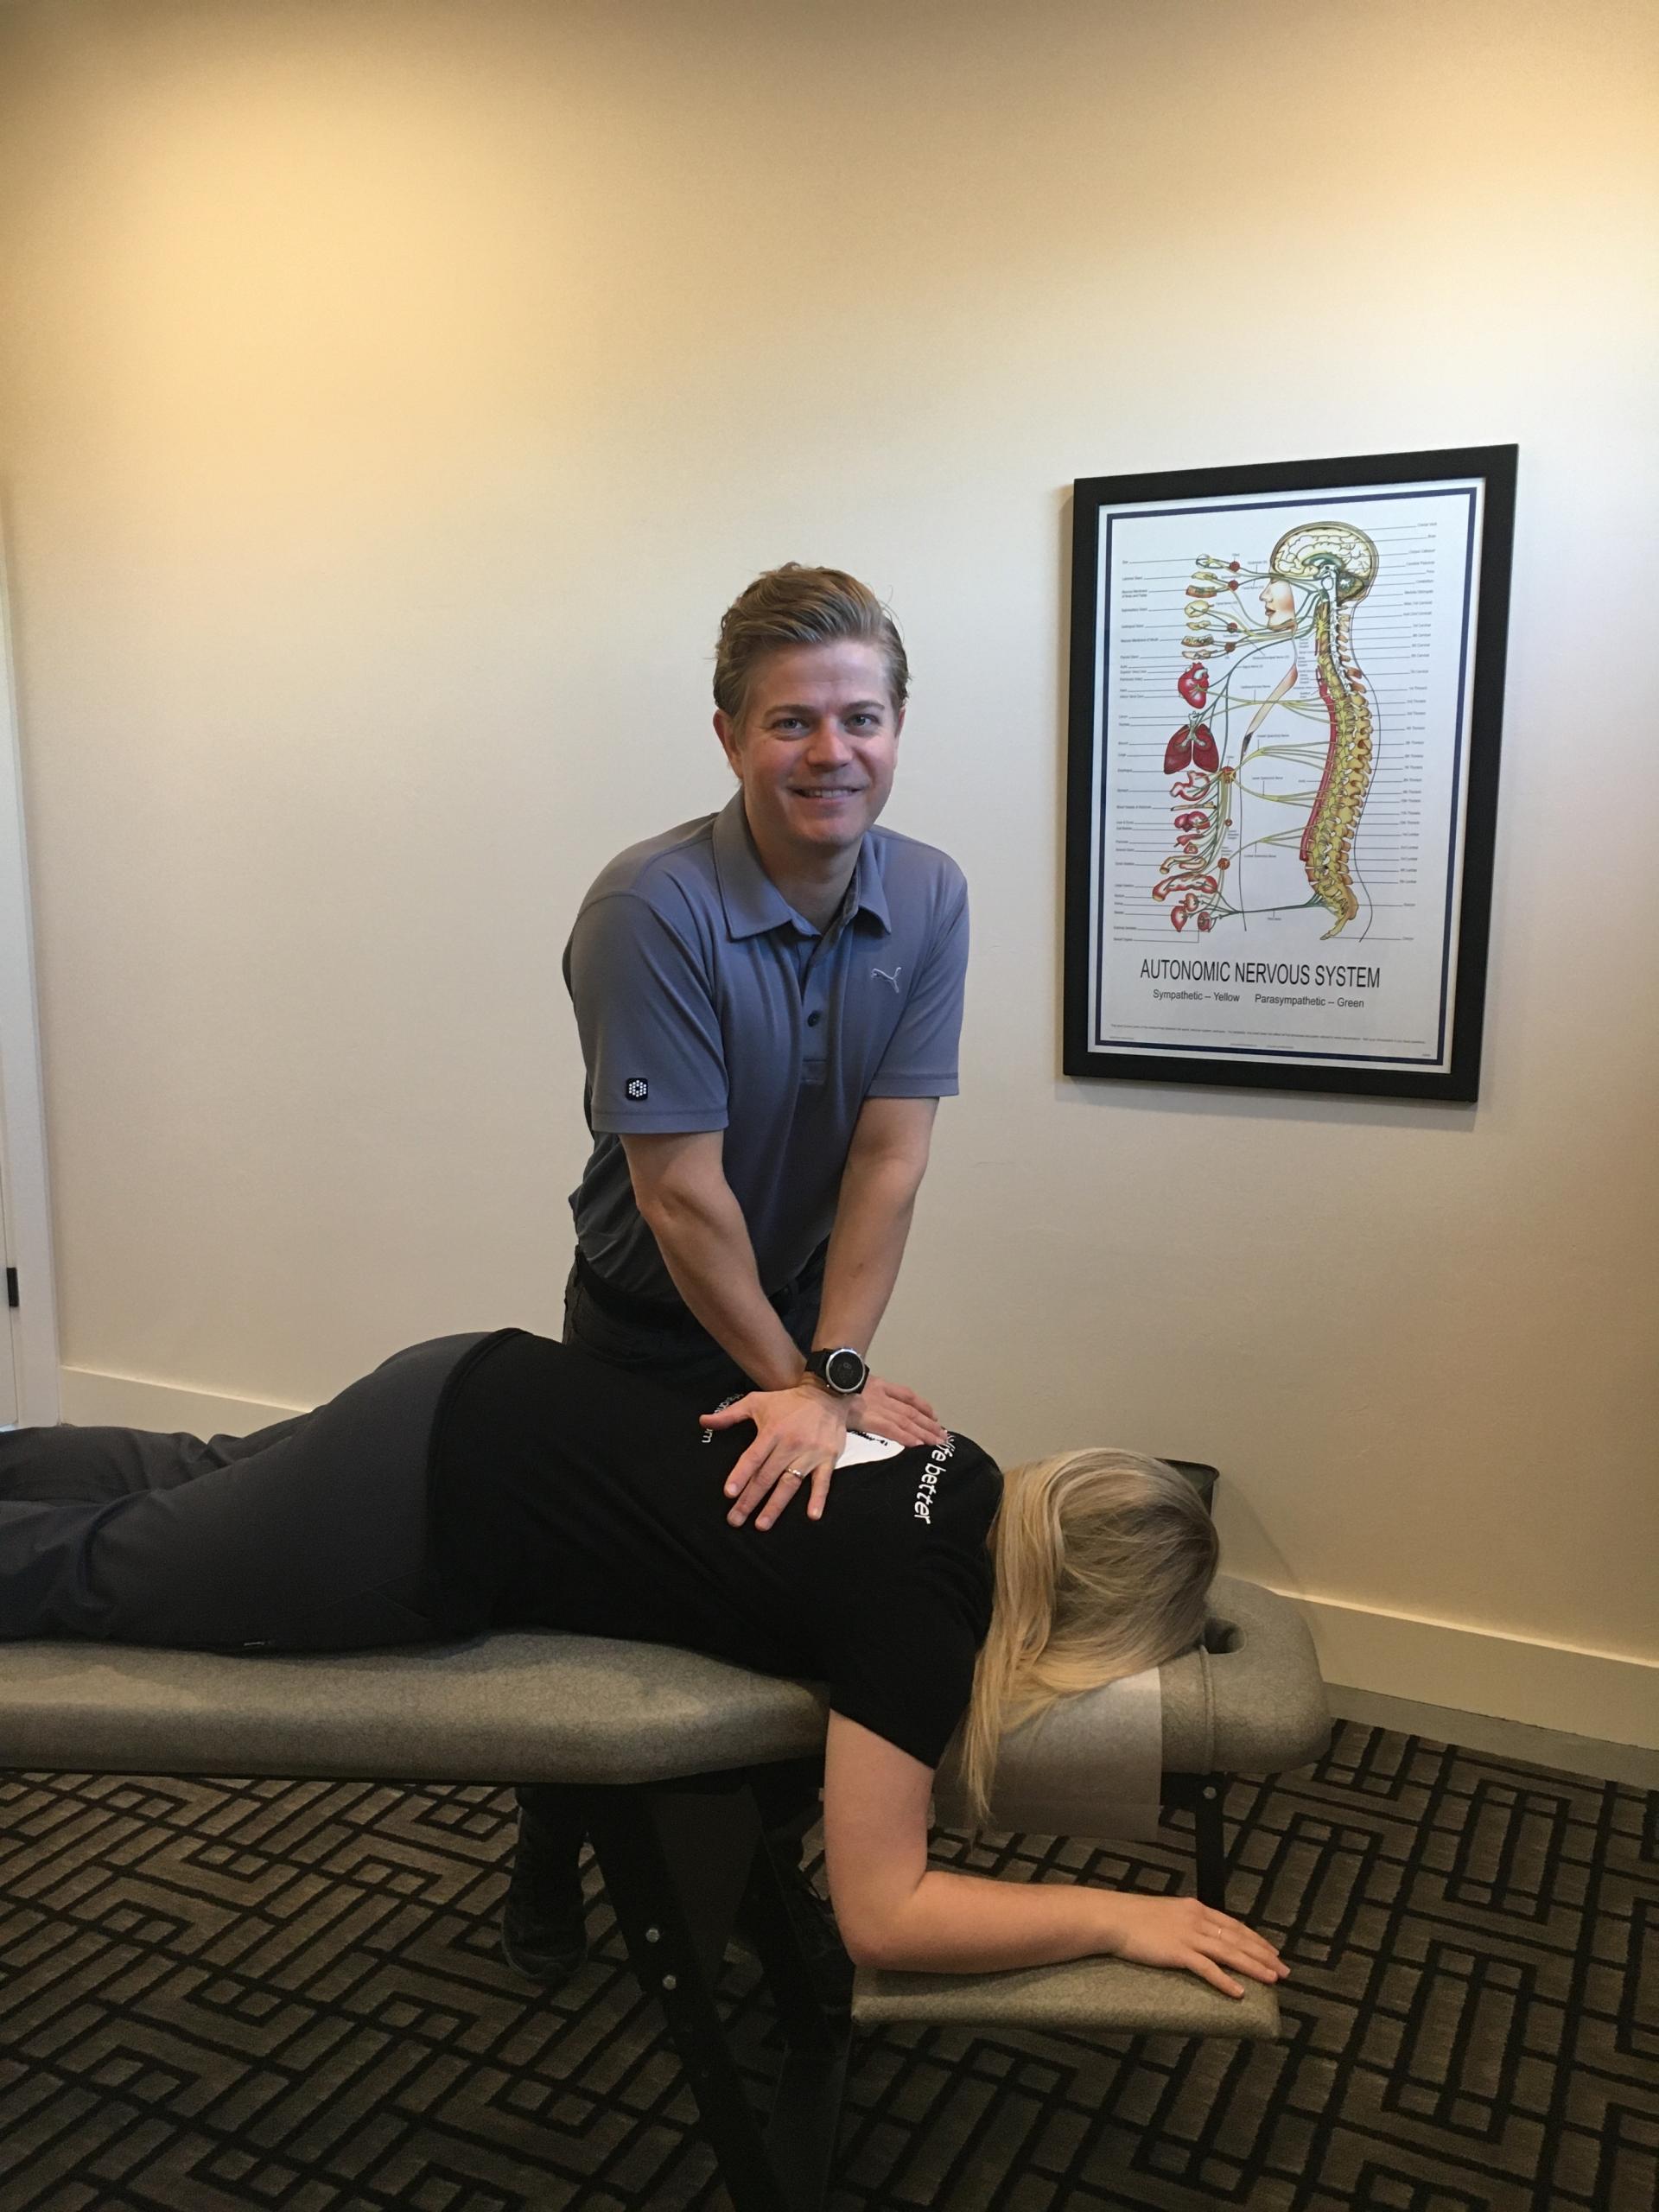 1st Chiropractic adjustment reaction 🙏🏽 - YouTube